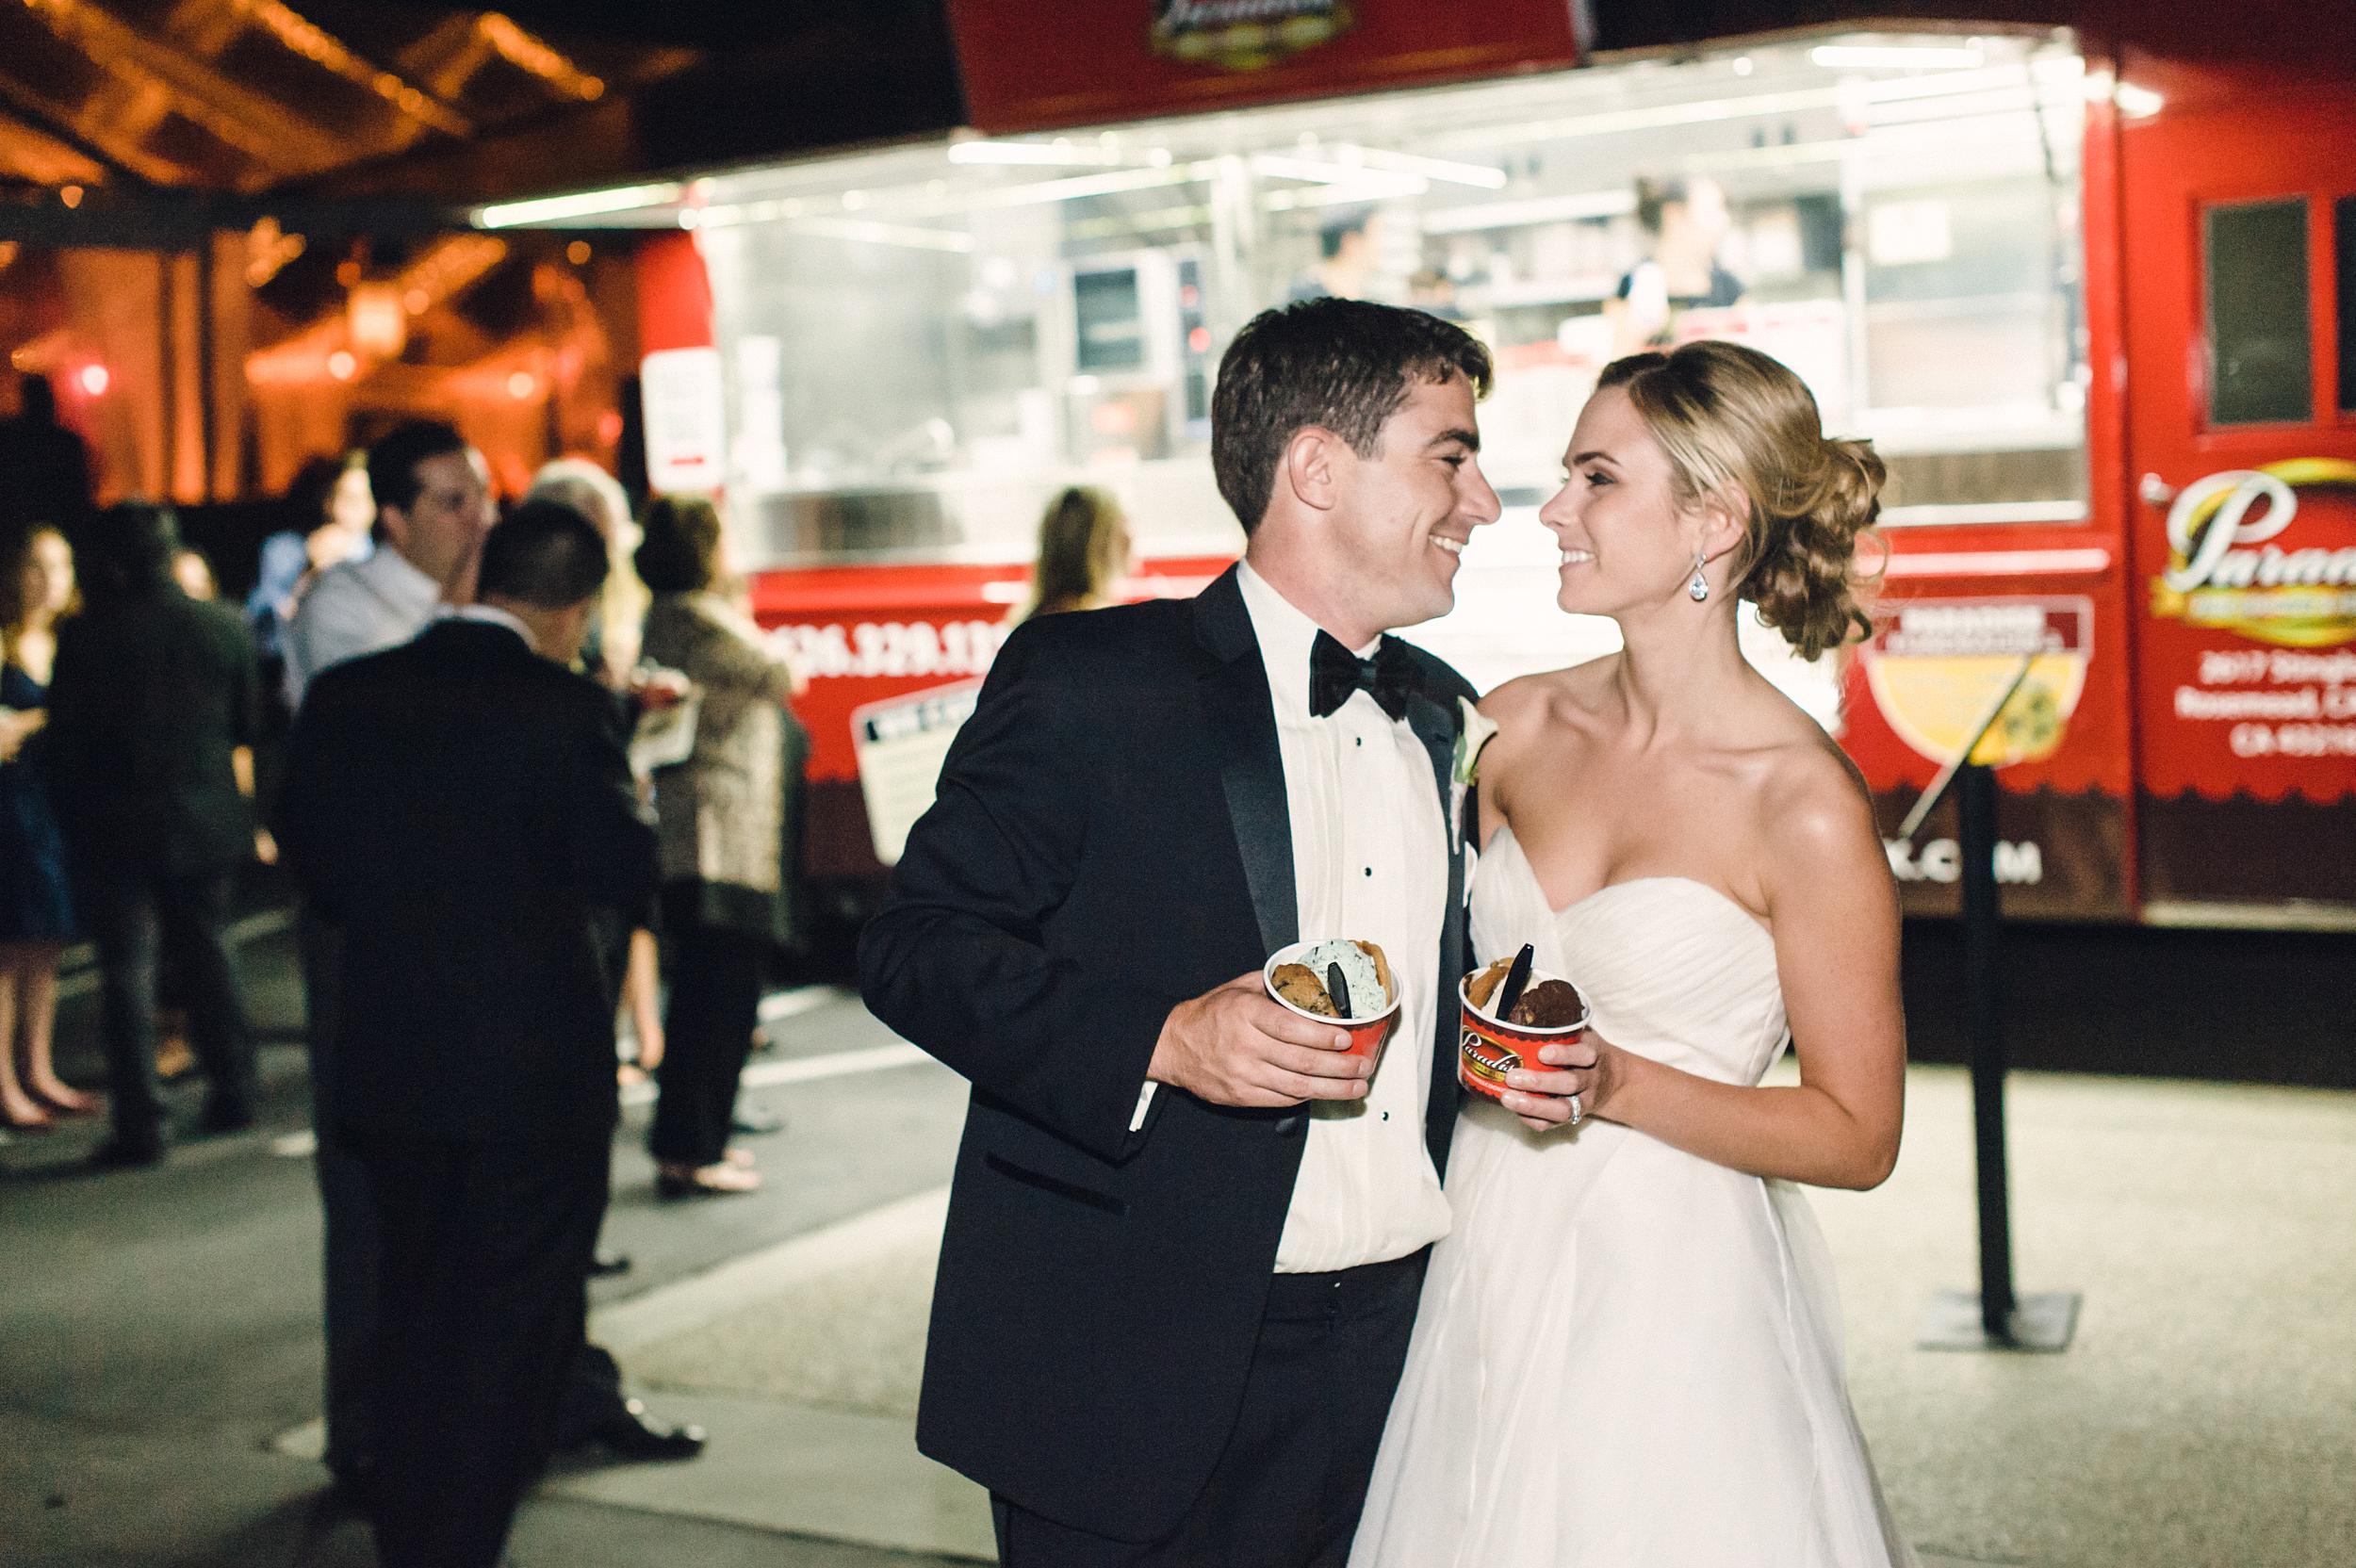 annandale-golf-club-pasadena-wedding-JM-27.jpg